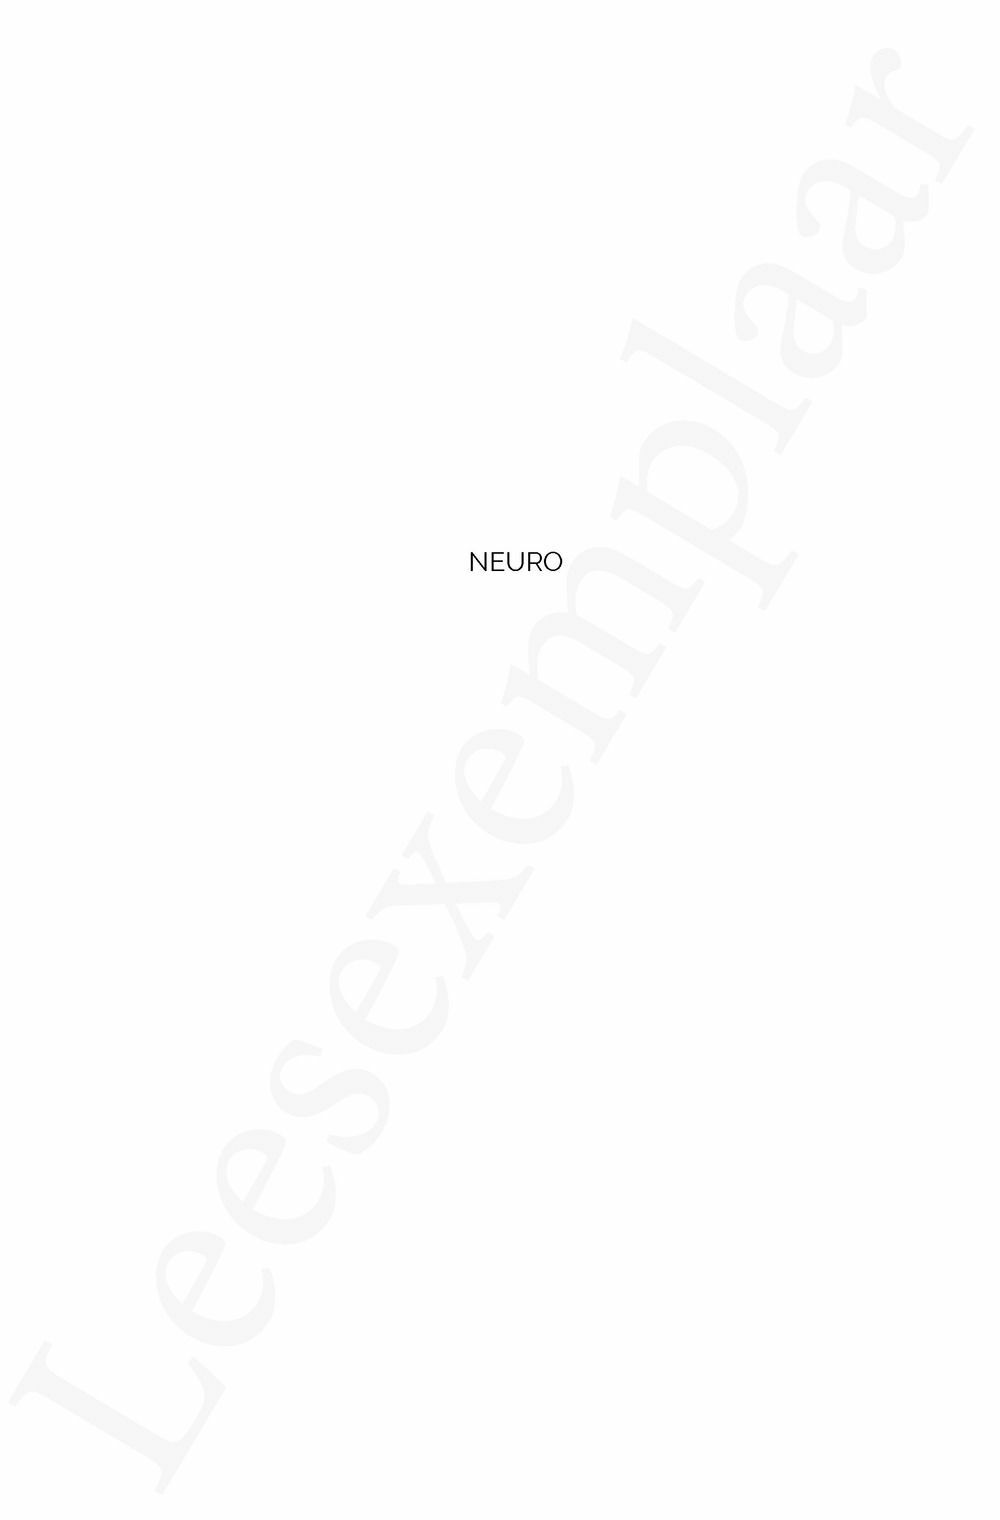 Preview: NEURO